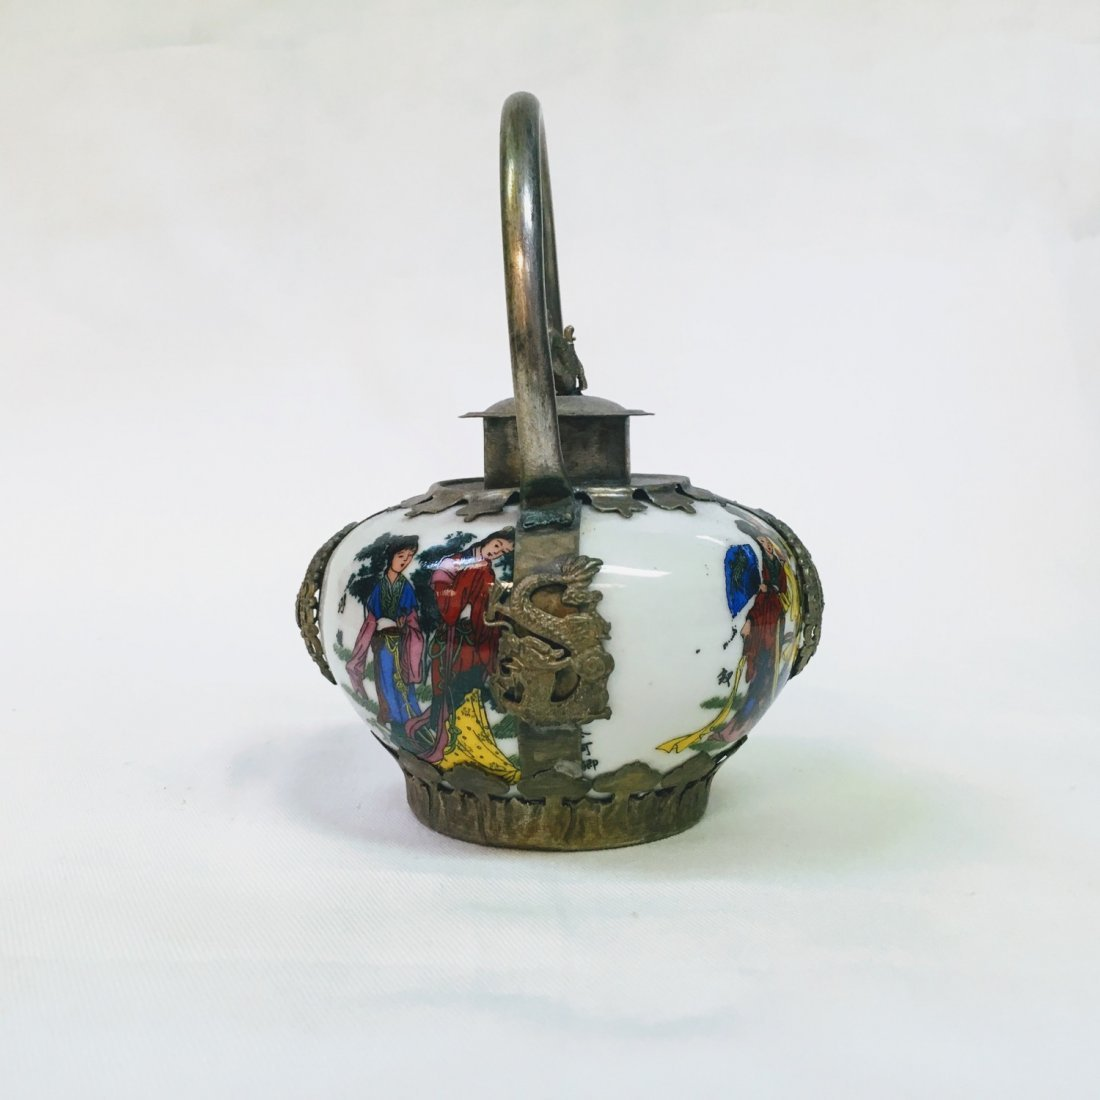 Chinese Vintage Porcelain & Metal Teapot - 2